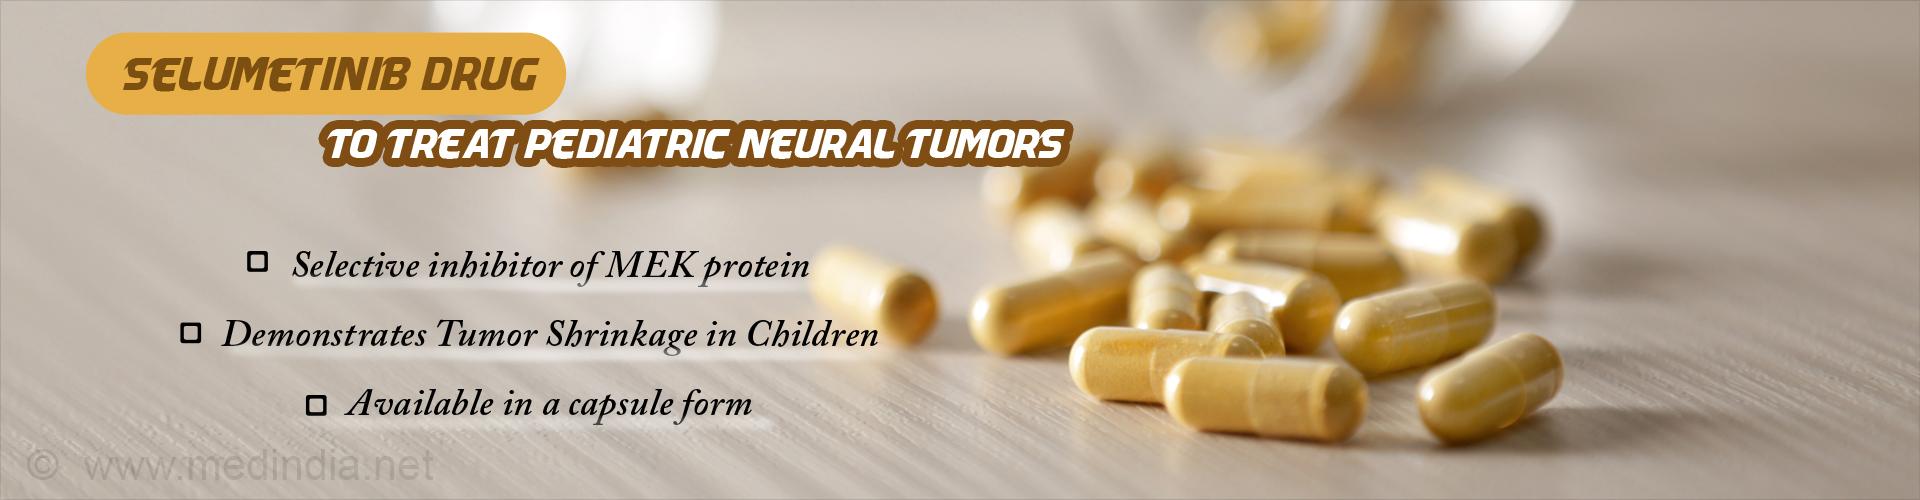 Selumetinib Drug Found to Shrink Pediatric Neural Tumors